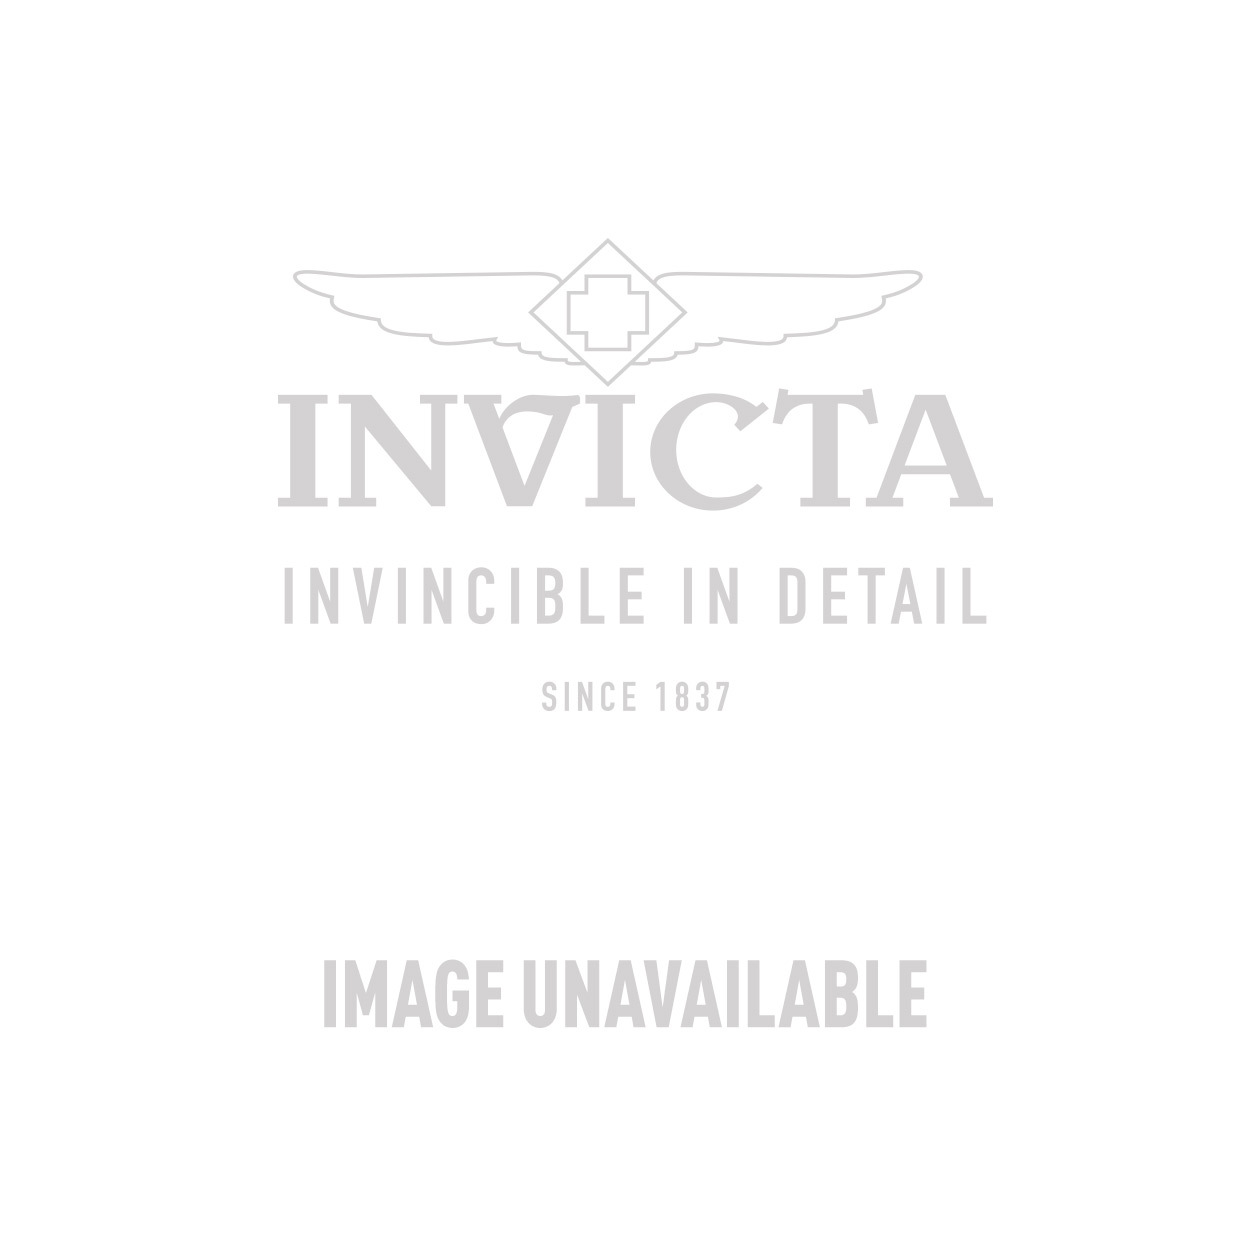 Invicta Speedway Swiss Movement Quartz Watch - Stainless Steel case with Black tone Polyurethane band - Model 1322